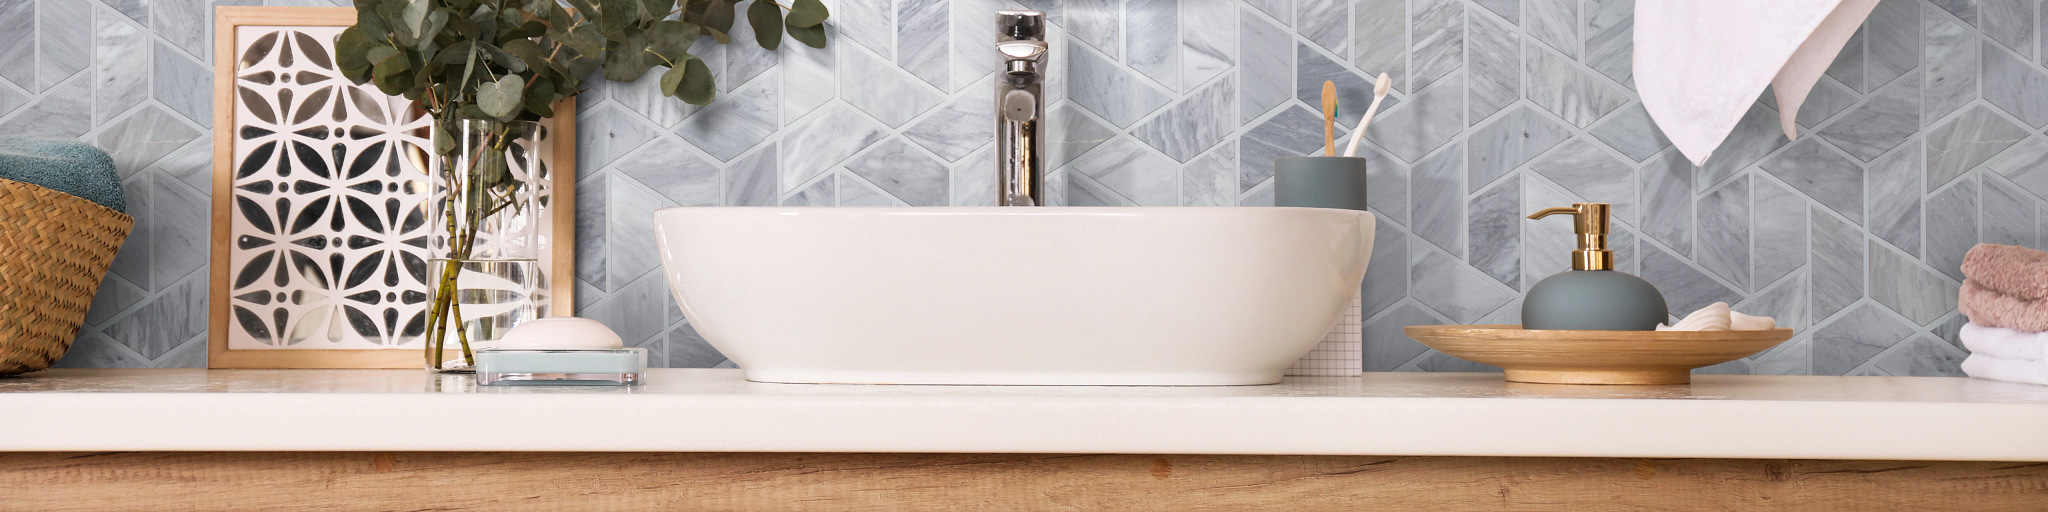 Tile-and-Stone-Chateau-Double-Hexagon-Mosaic-380TS-00555-Bathroom-Backsplash-2021